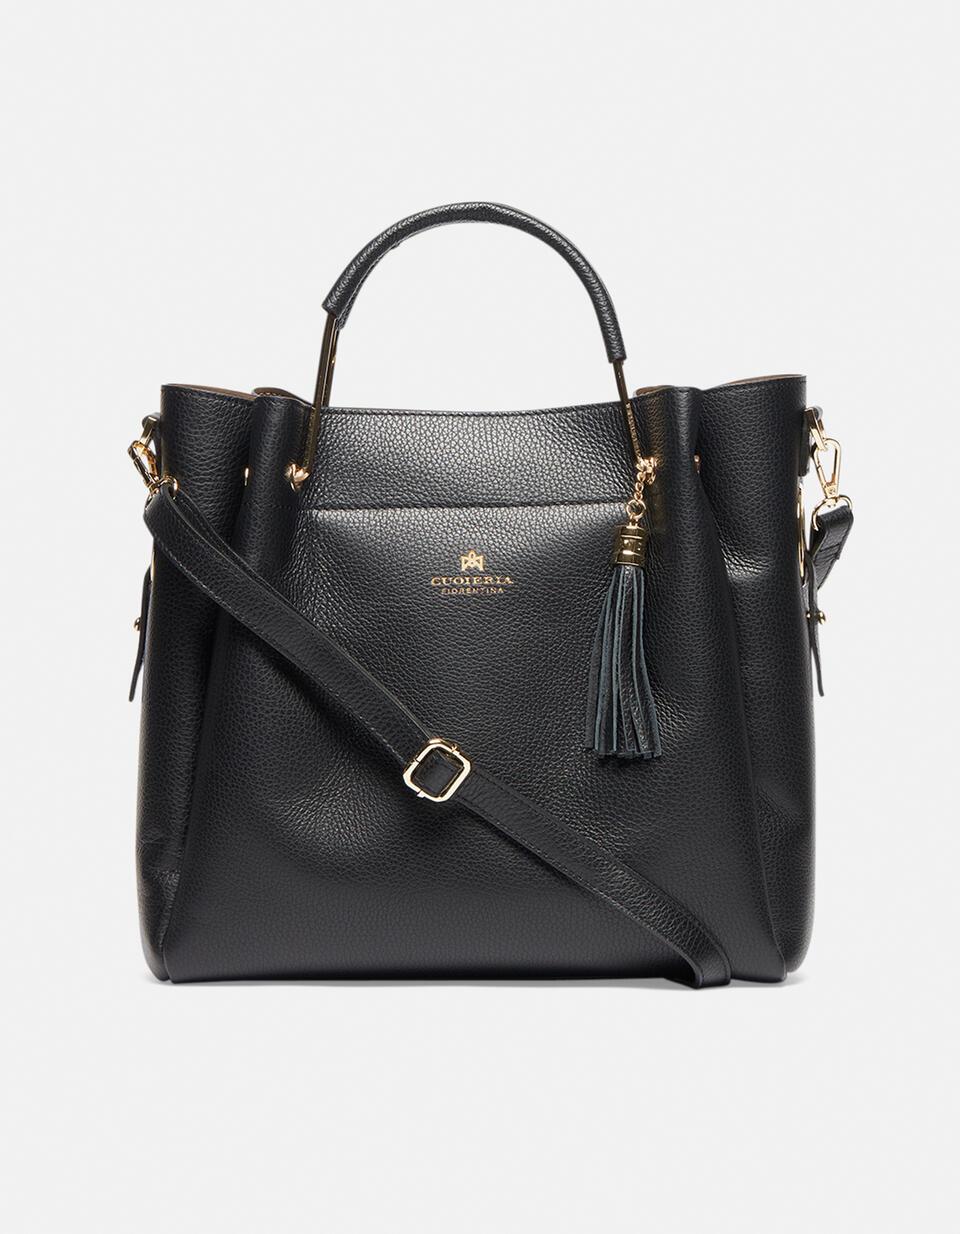 Hand bag in hammered calf leather NERO Cuoieria Fiorentina